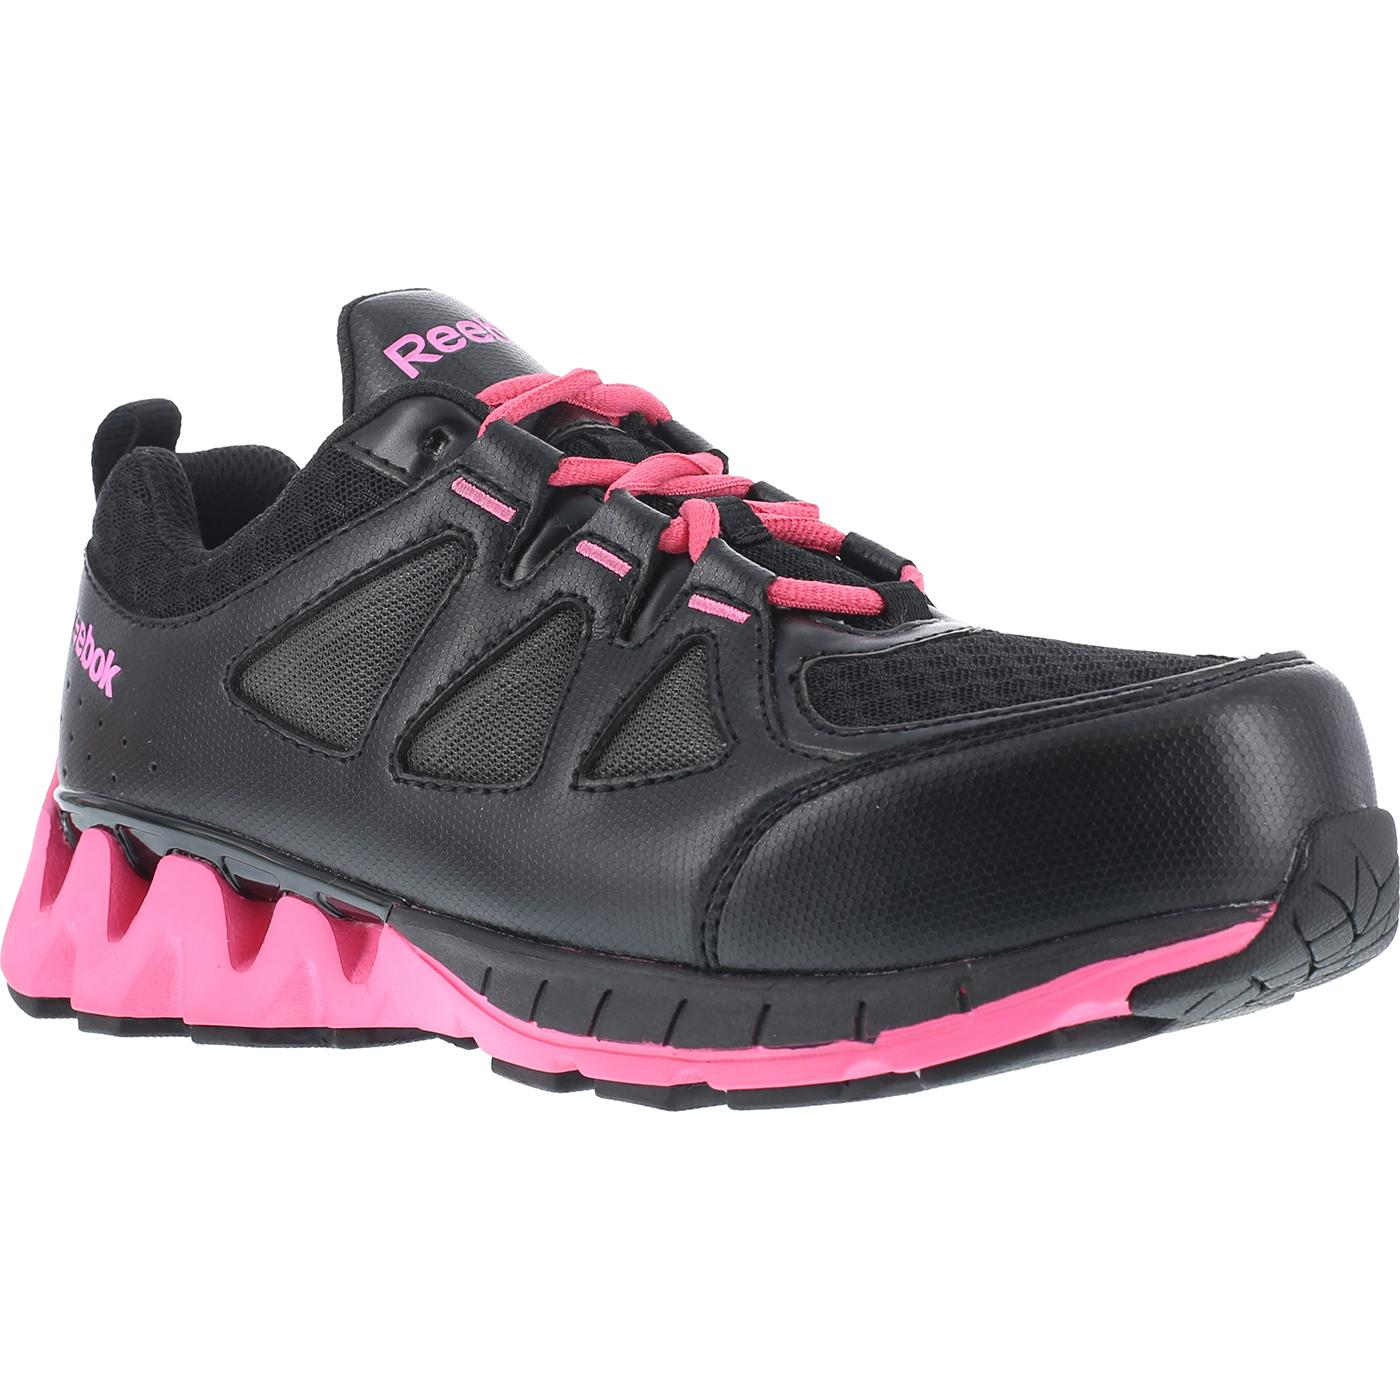 1fe037e8696 Reebok Zigkick Work Women s Composite Toe Work Athletic Oxford